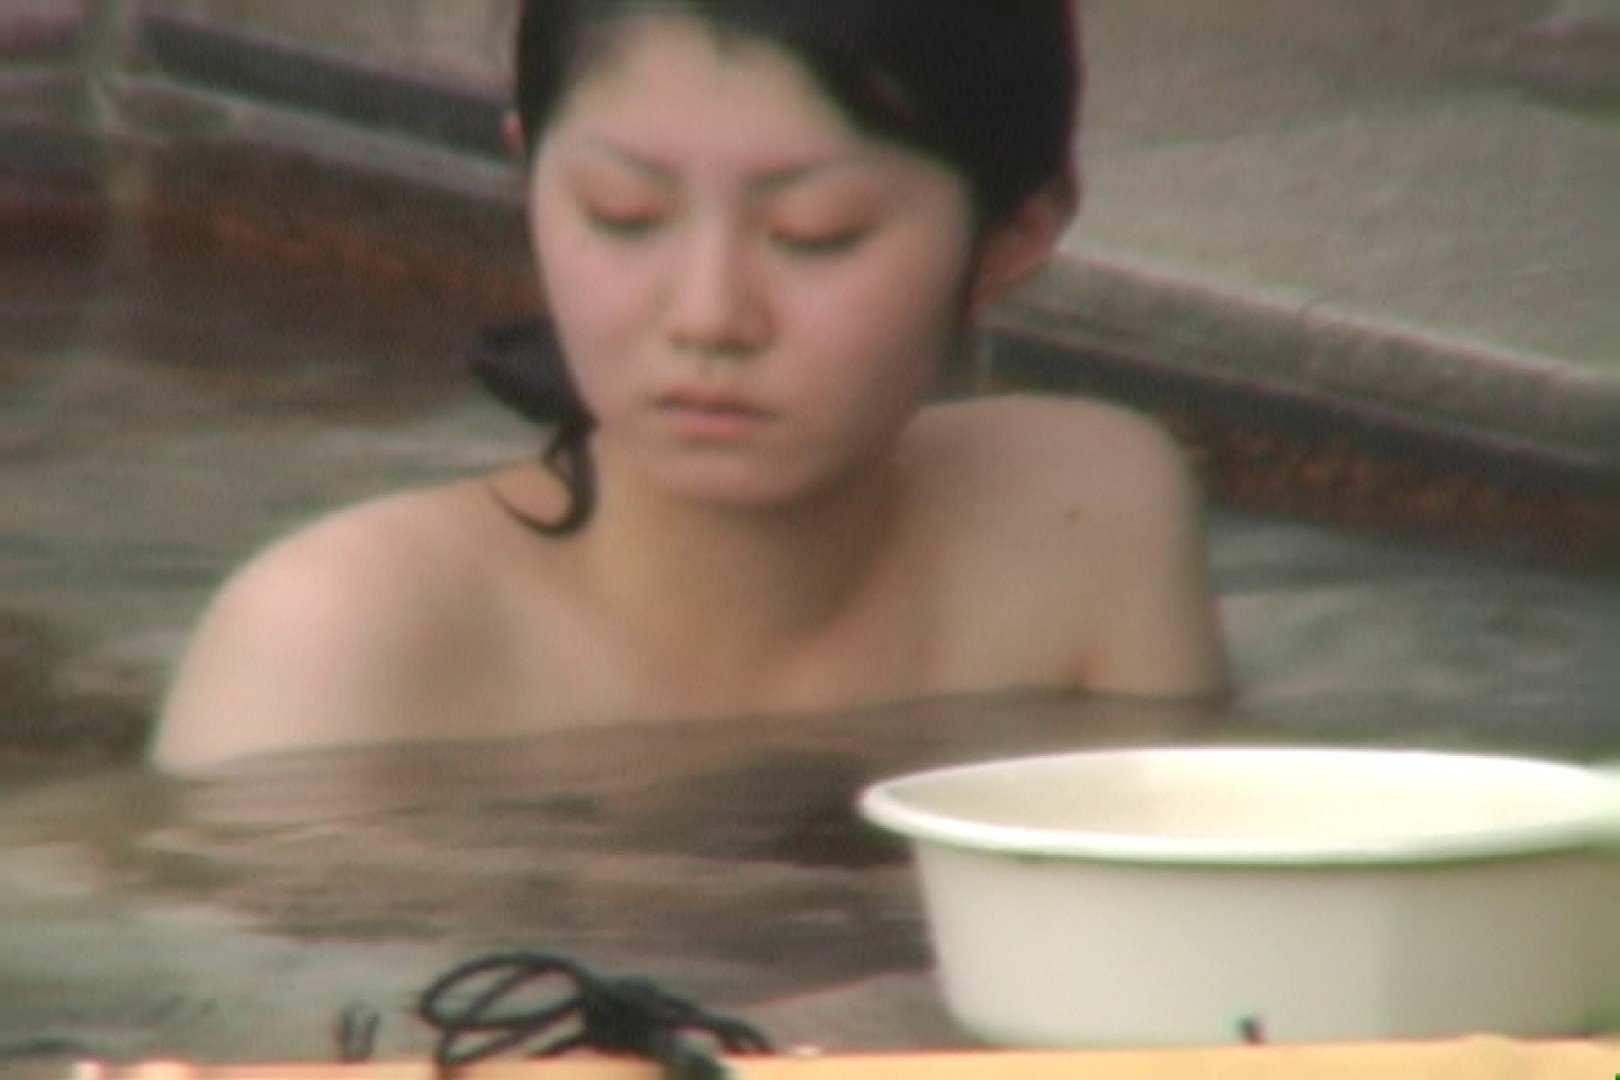 Aquaな露天風呂Vol.579 OL女体 | 露天  72連発 40